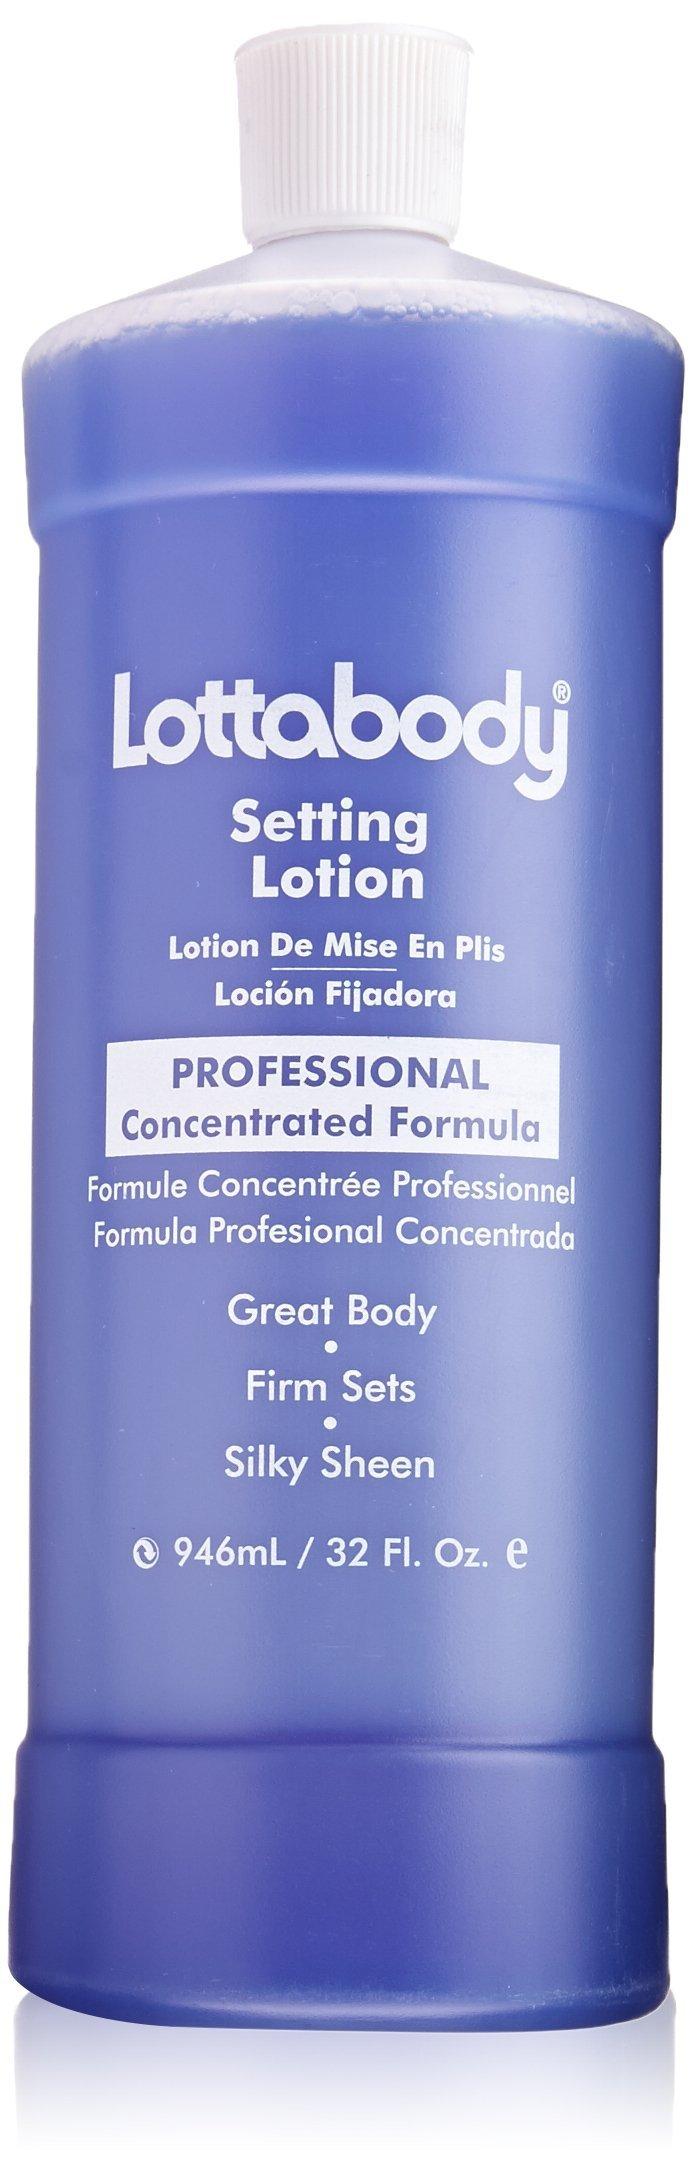 Lotta Body Setting Lotion, 32 Ounce by Lottabody